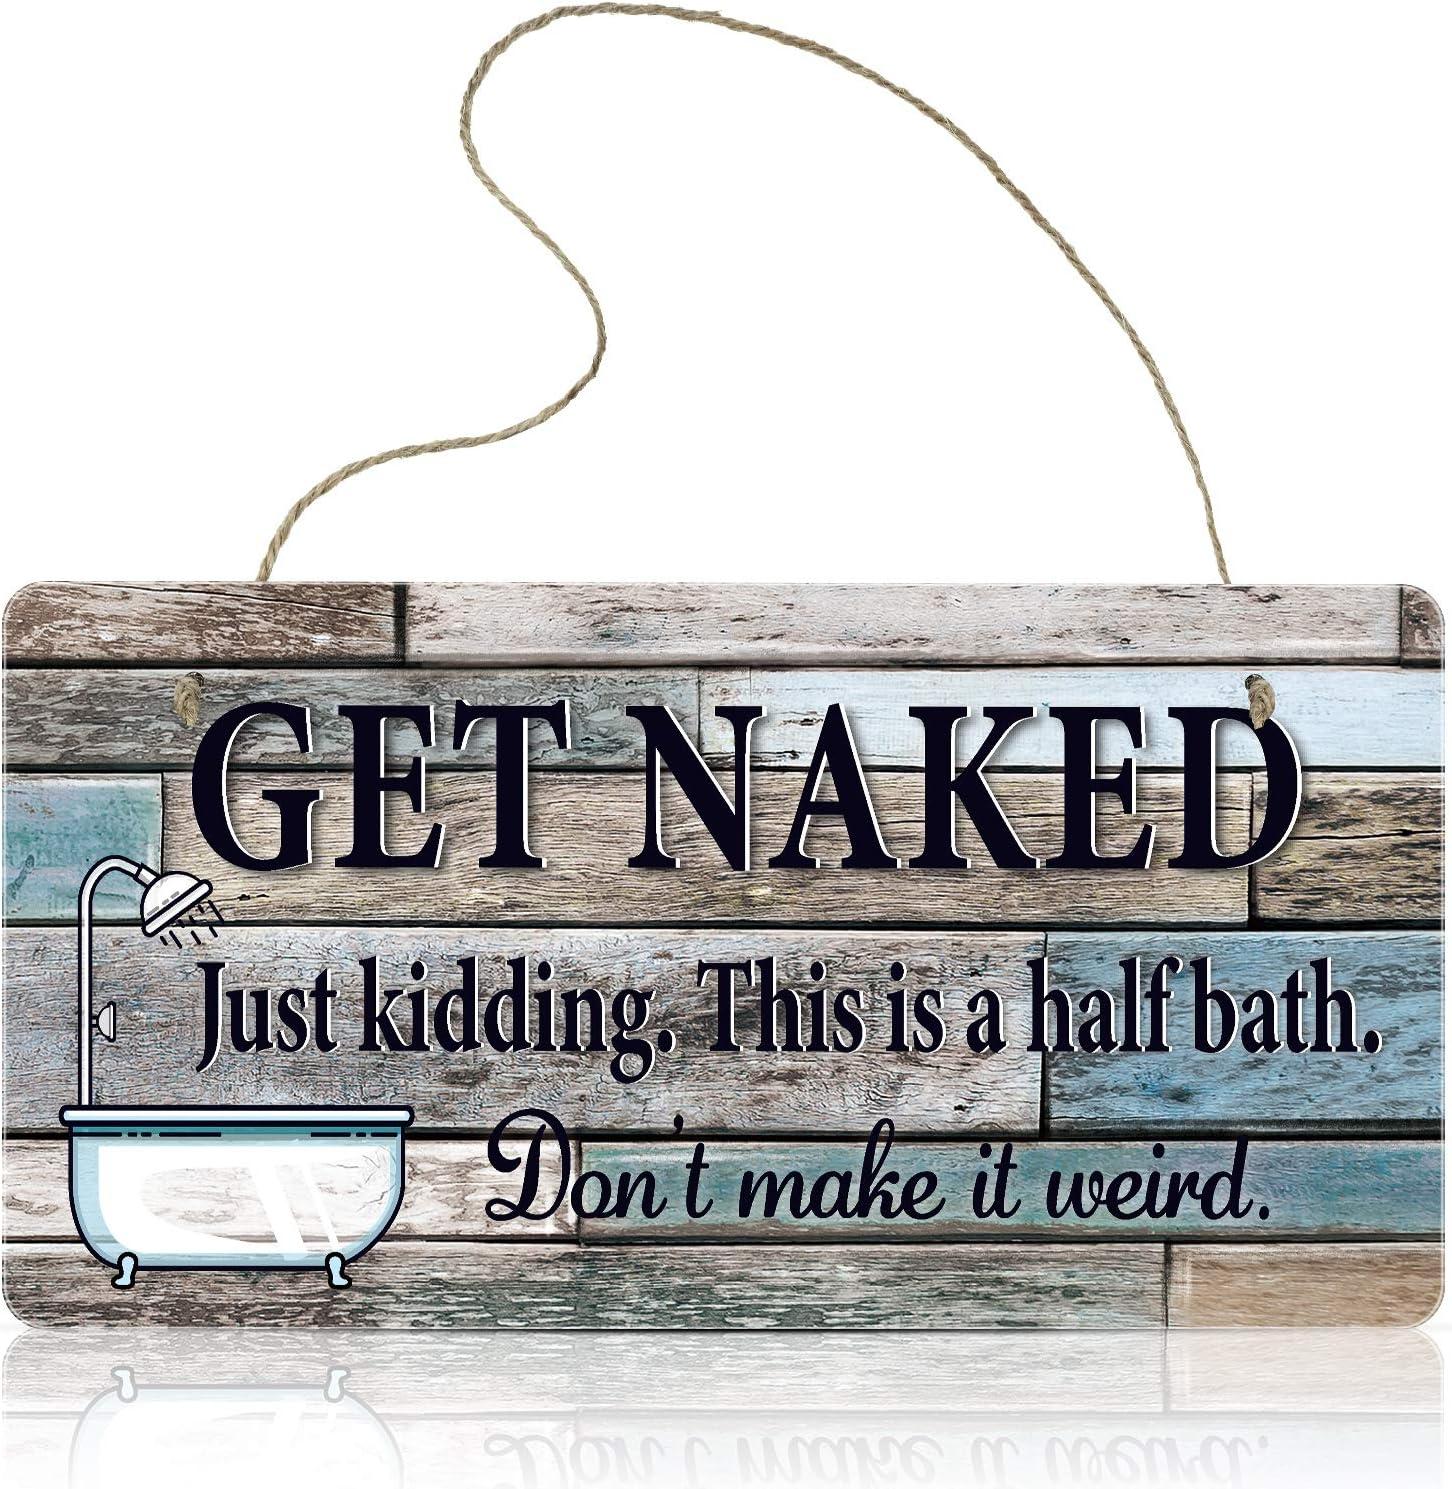 Jetec Funny Bathroom Decoration Sign Get Naked Wall Art Sign 9.8 x 5.1 inch Inch Hanging Wall Art Sign Home Bathroom Decor